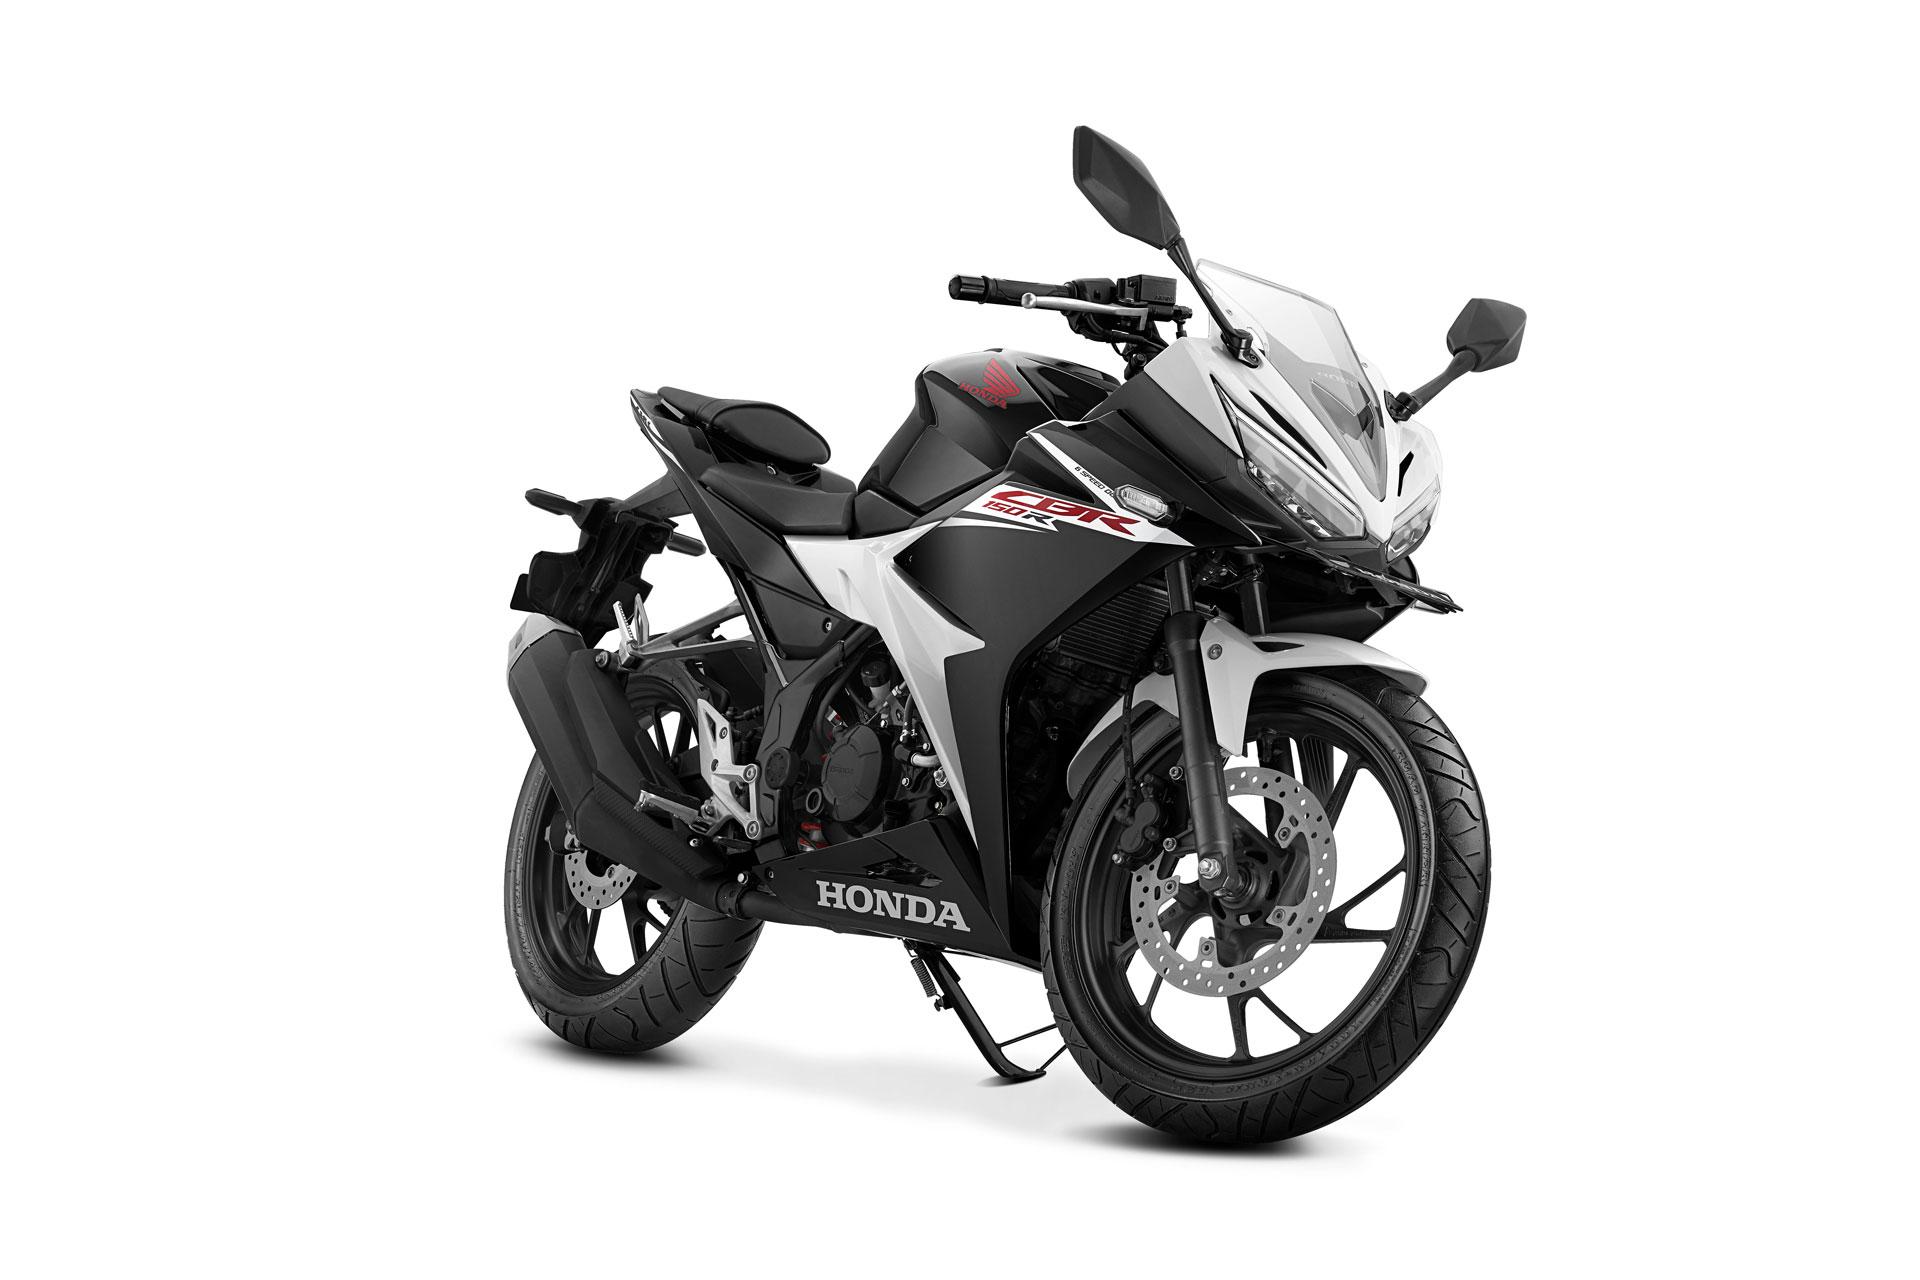 Honda cbr150r terbaru 2017 putih hitam